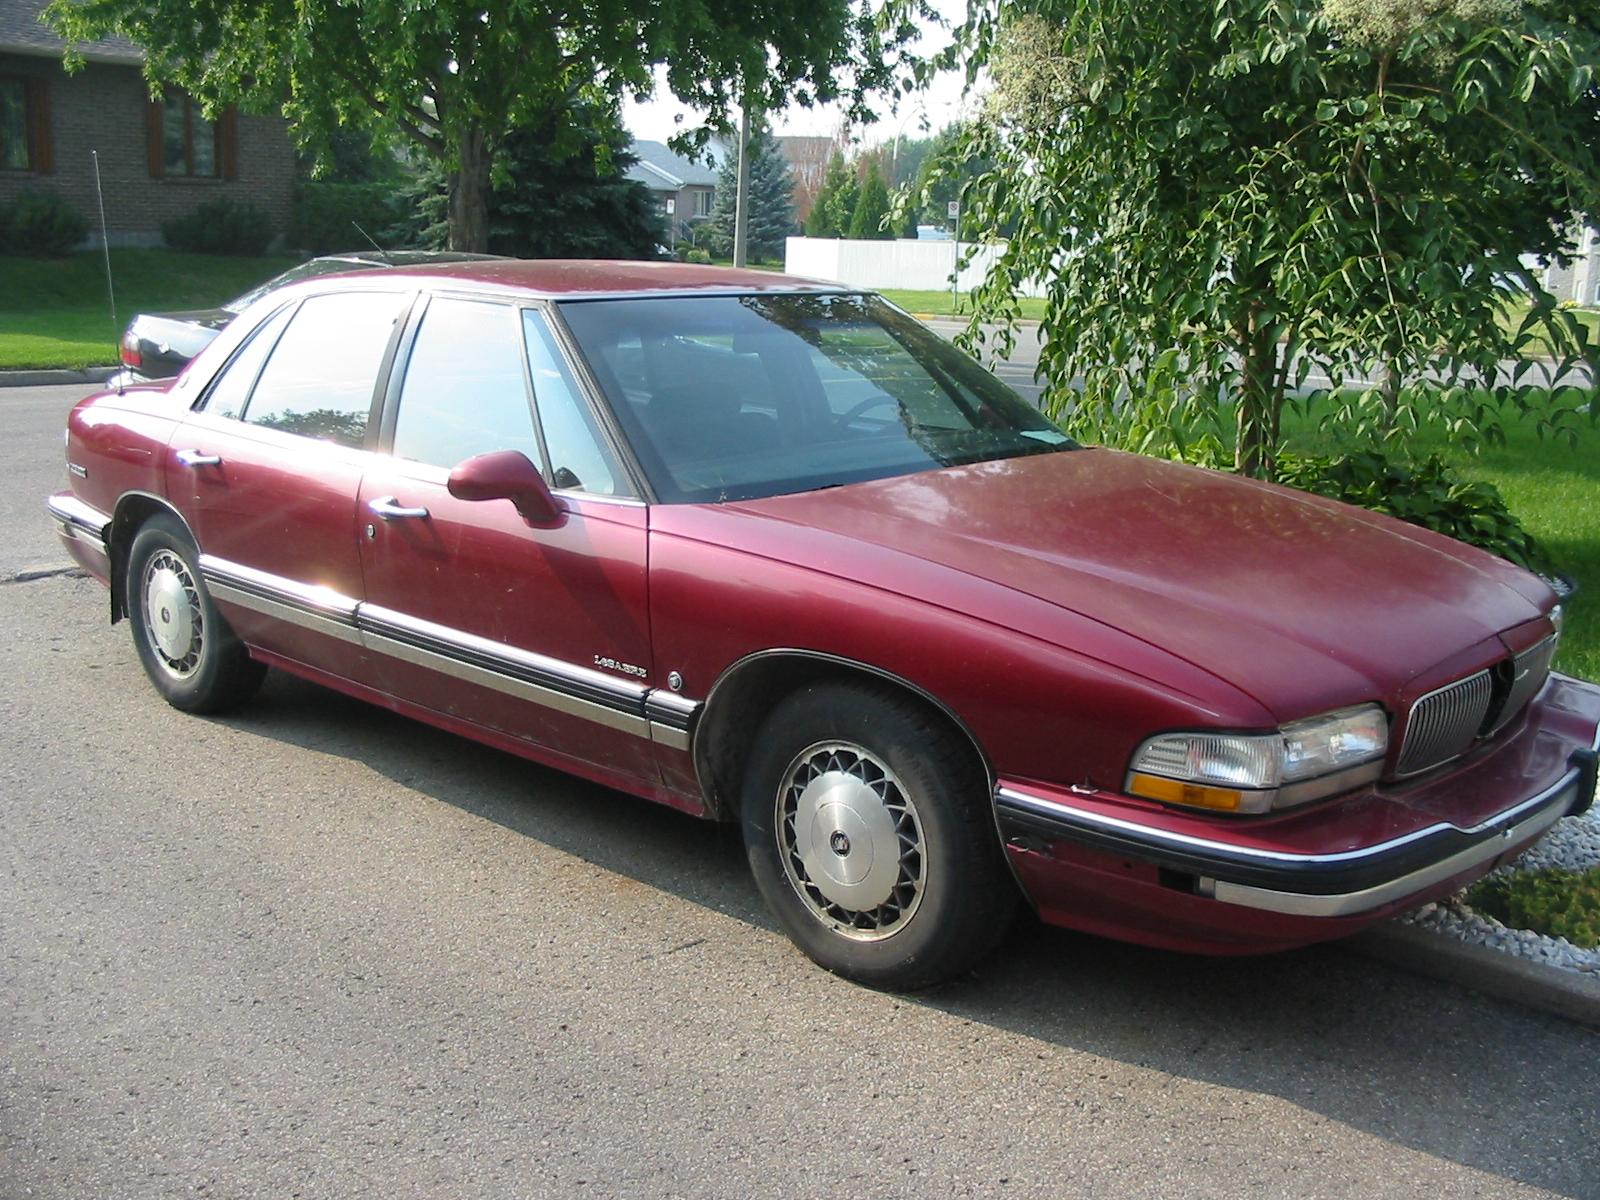 Picture of 1995 buick lesabre custom exterior